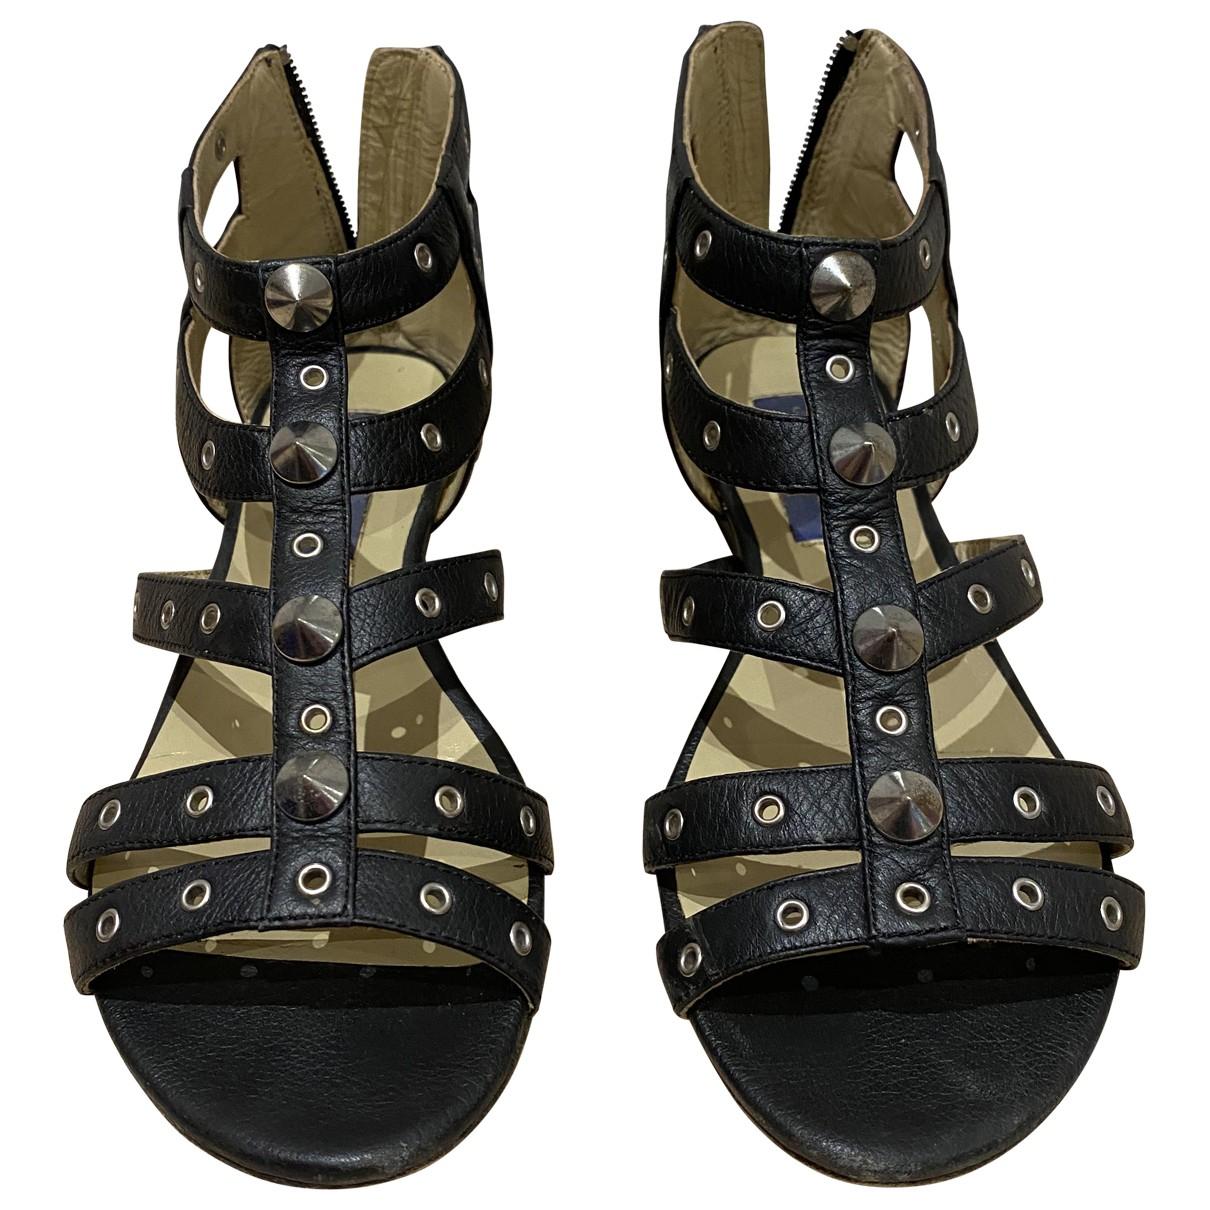 Jimmy Choo For H&m \N Black Leather Flats for Women 37 EU